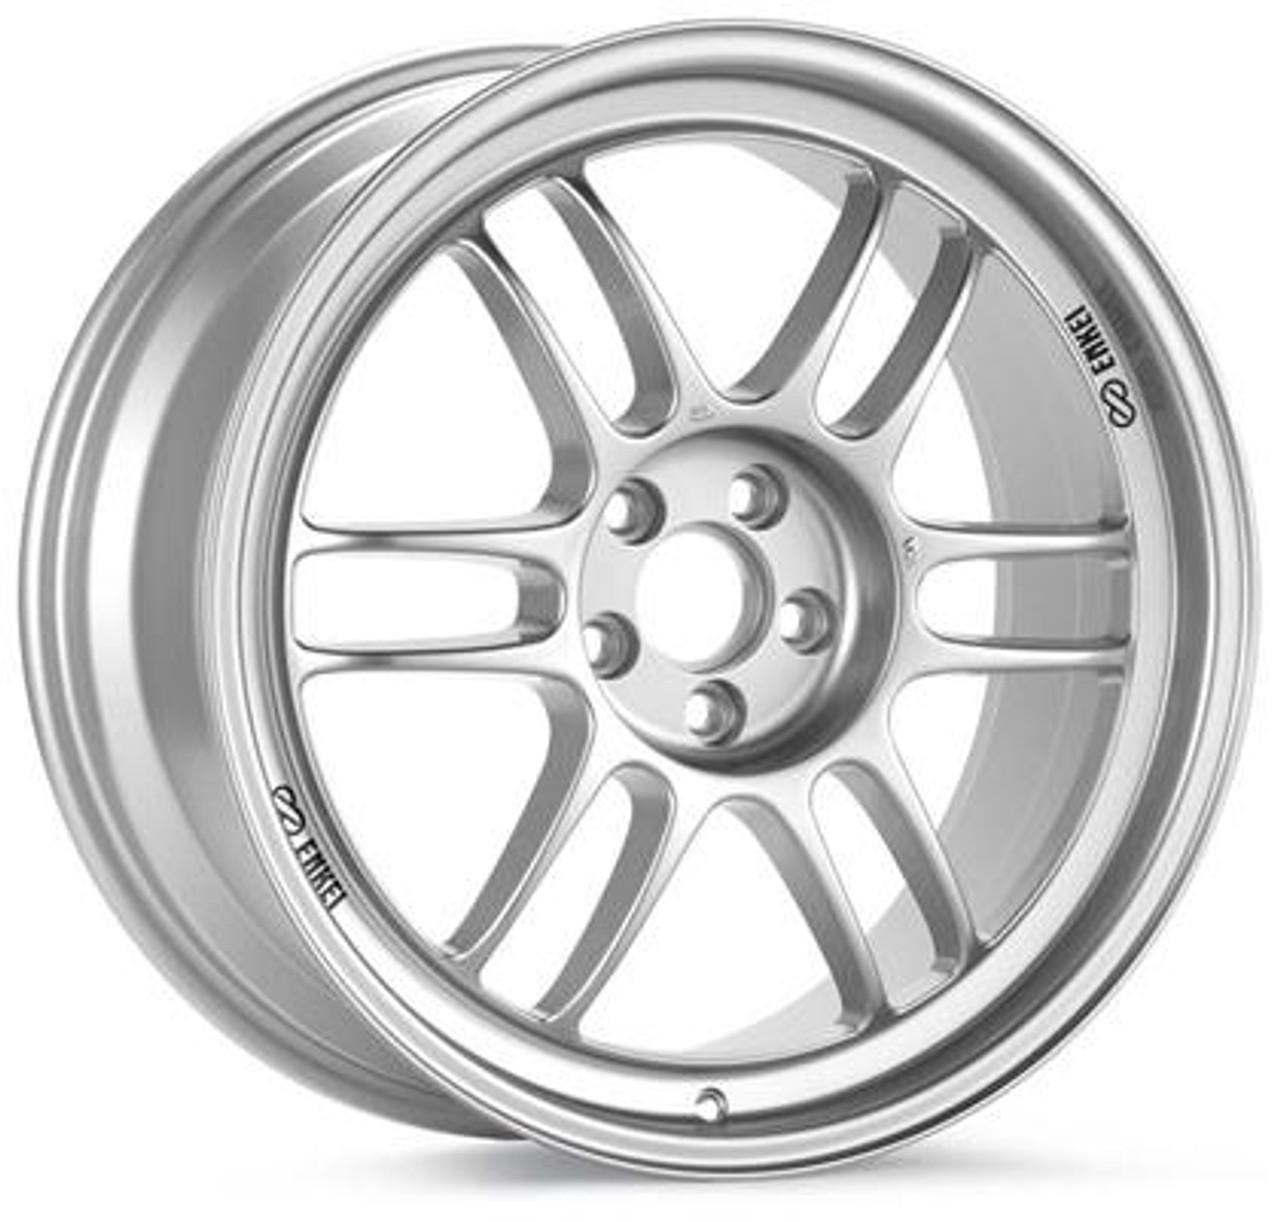 Enkei - RPF1 Wheels (F1 Silver, Gold)